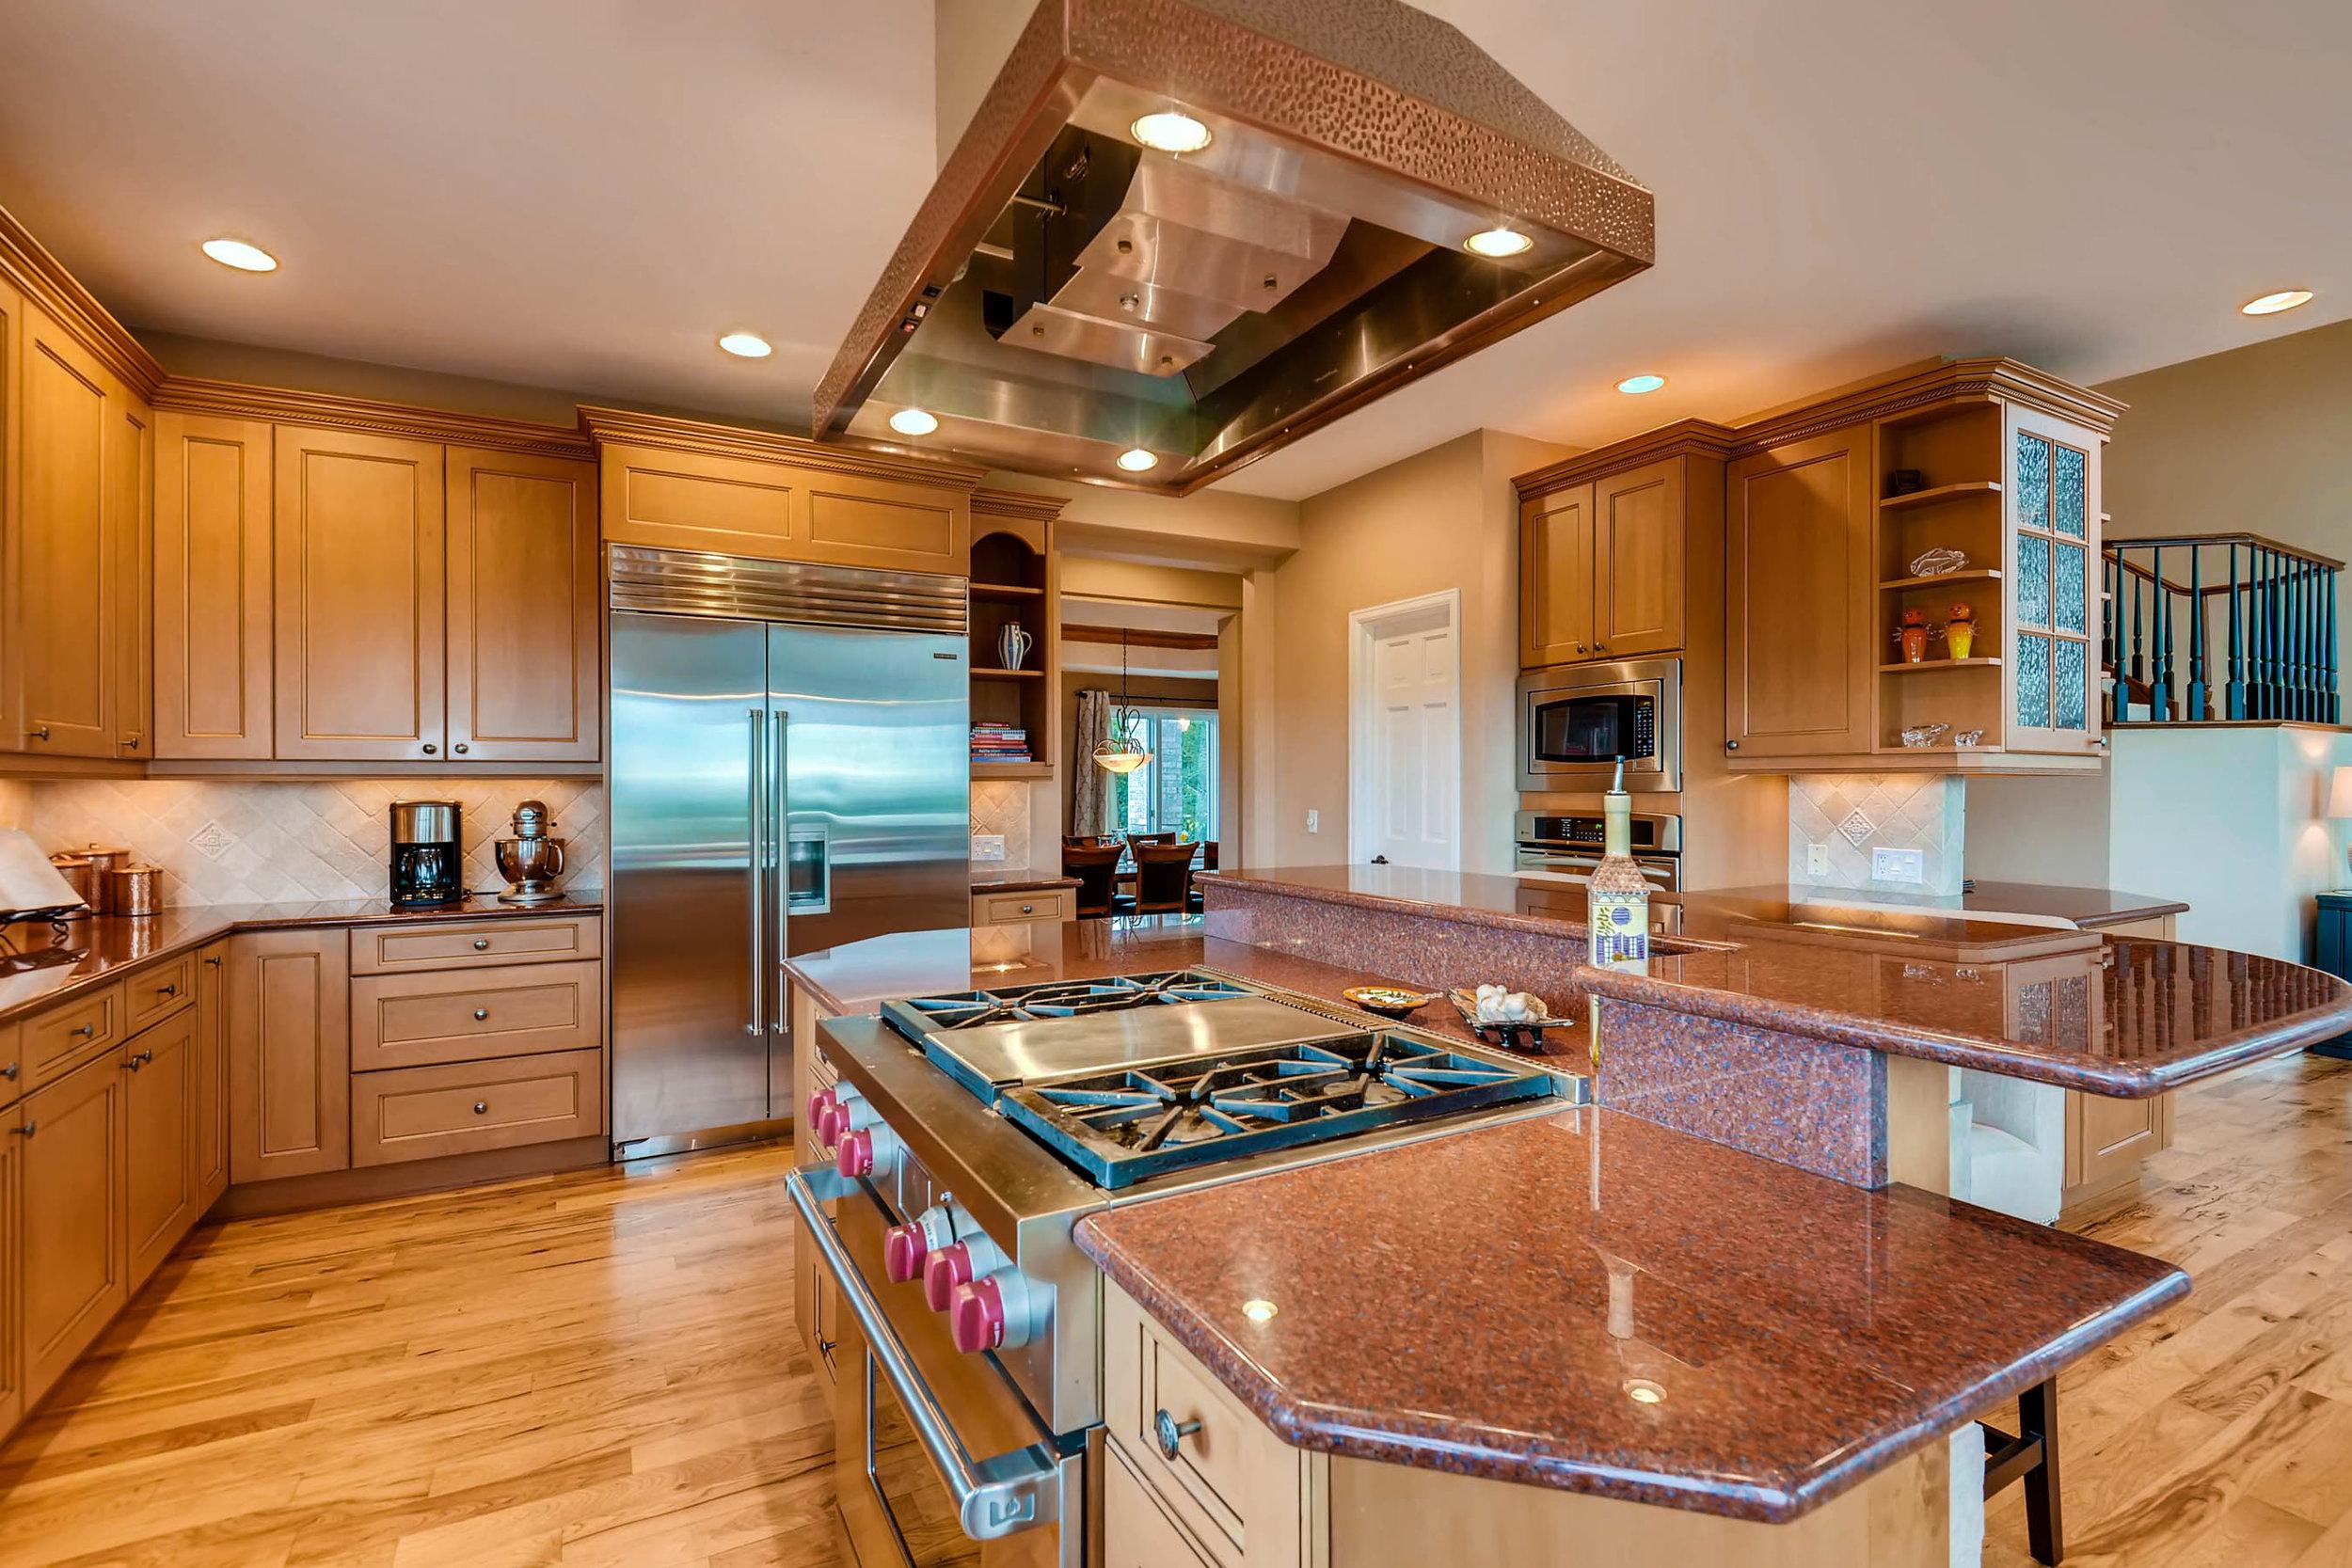 2449 S Yank Ct Lakewood CO-print-011-9-Kitchen-2700x1800-300dpi.jpg